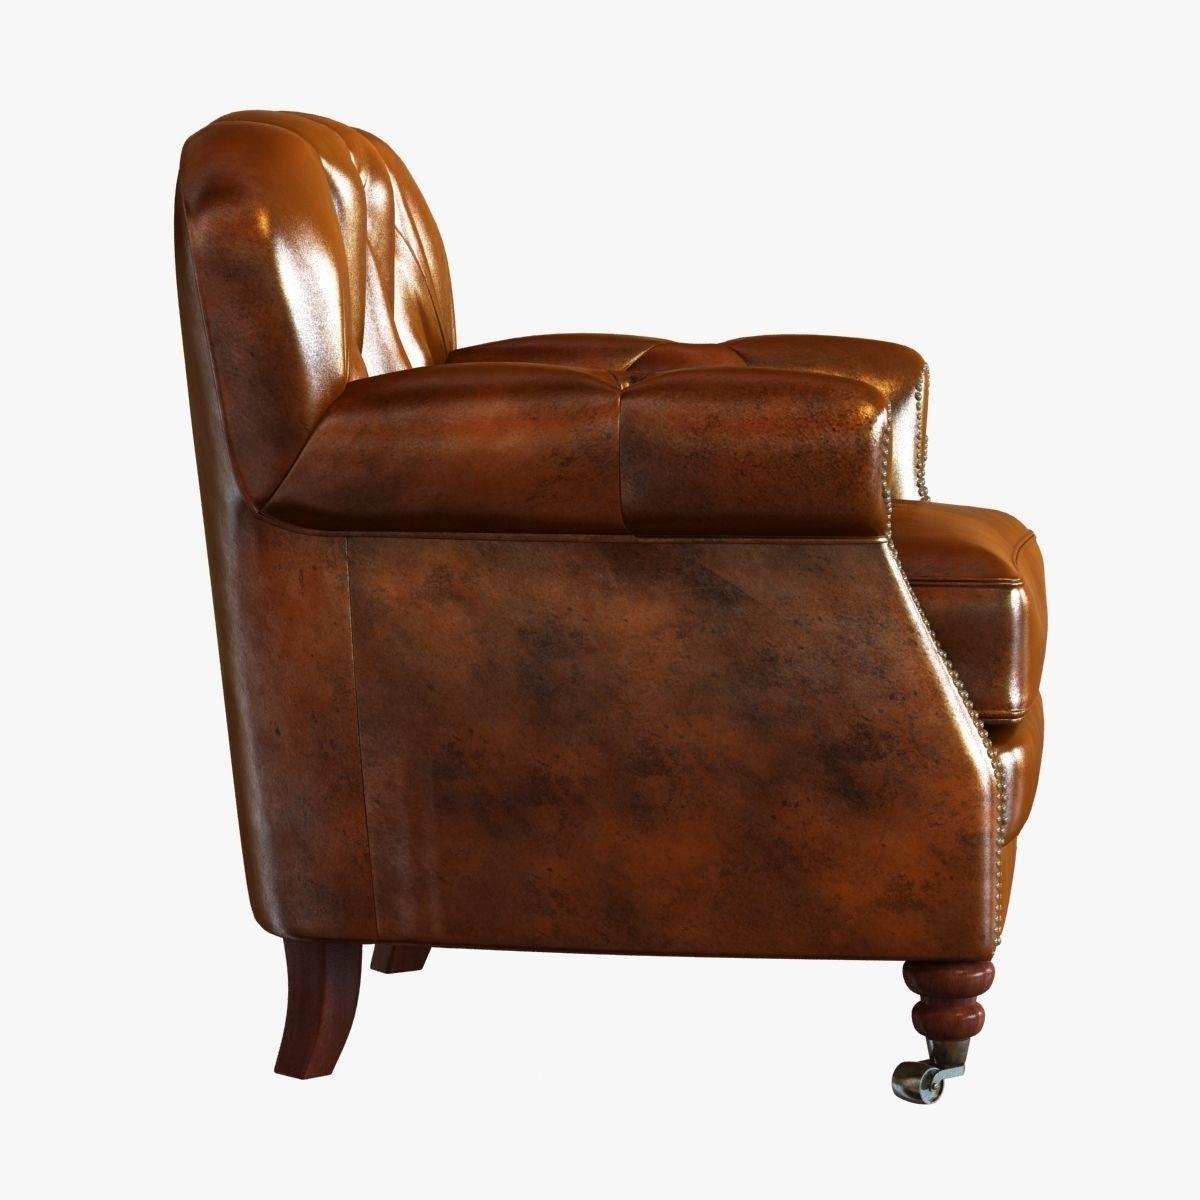 noir furniture club chair vintage cigar leather 3d model max obj 3ds fbx mtl